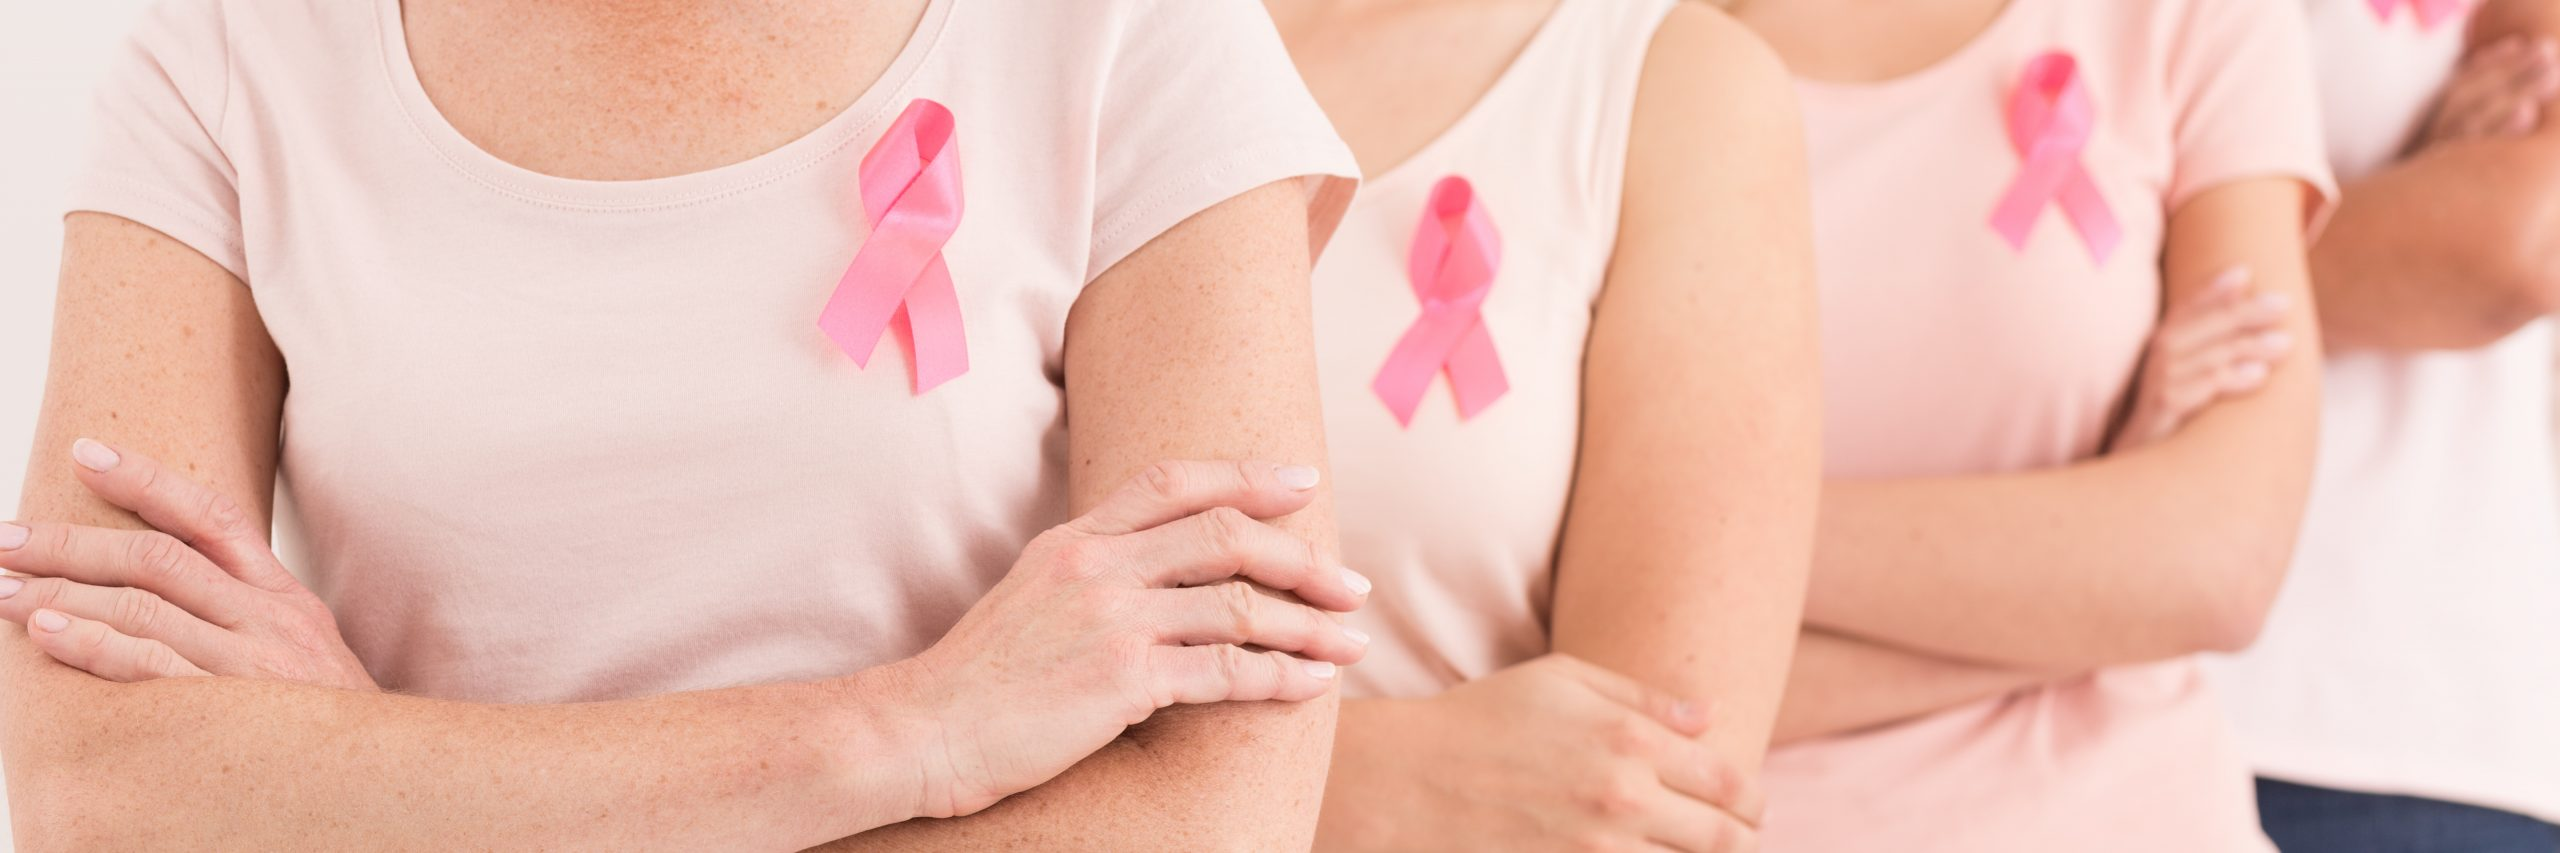 adenocarcinoma de mama